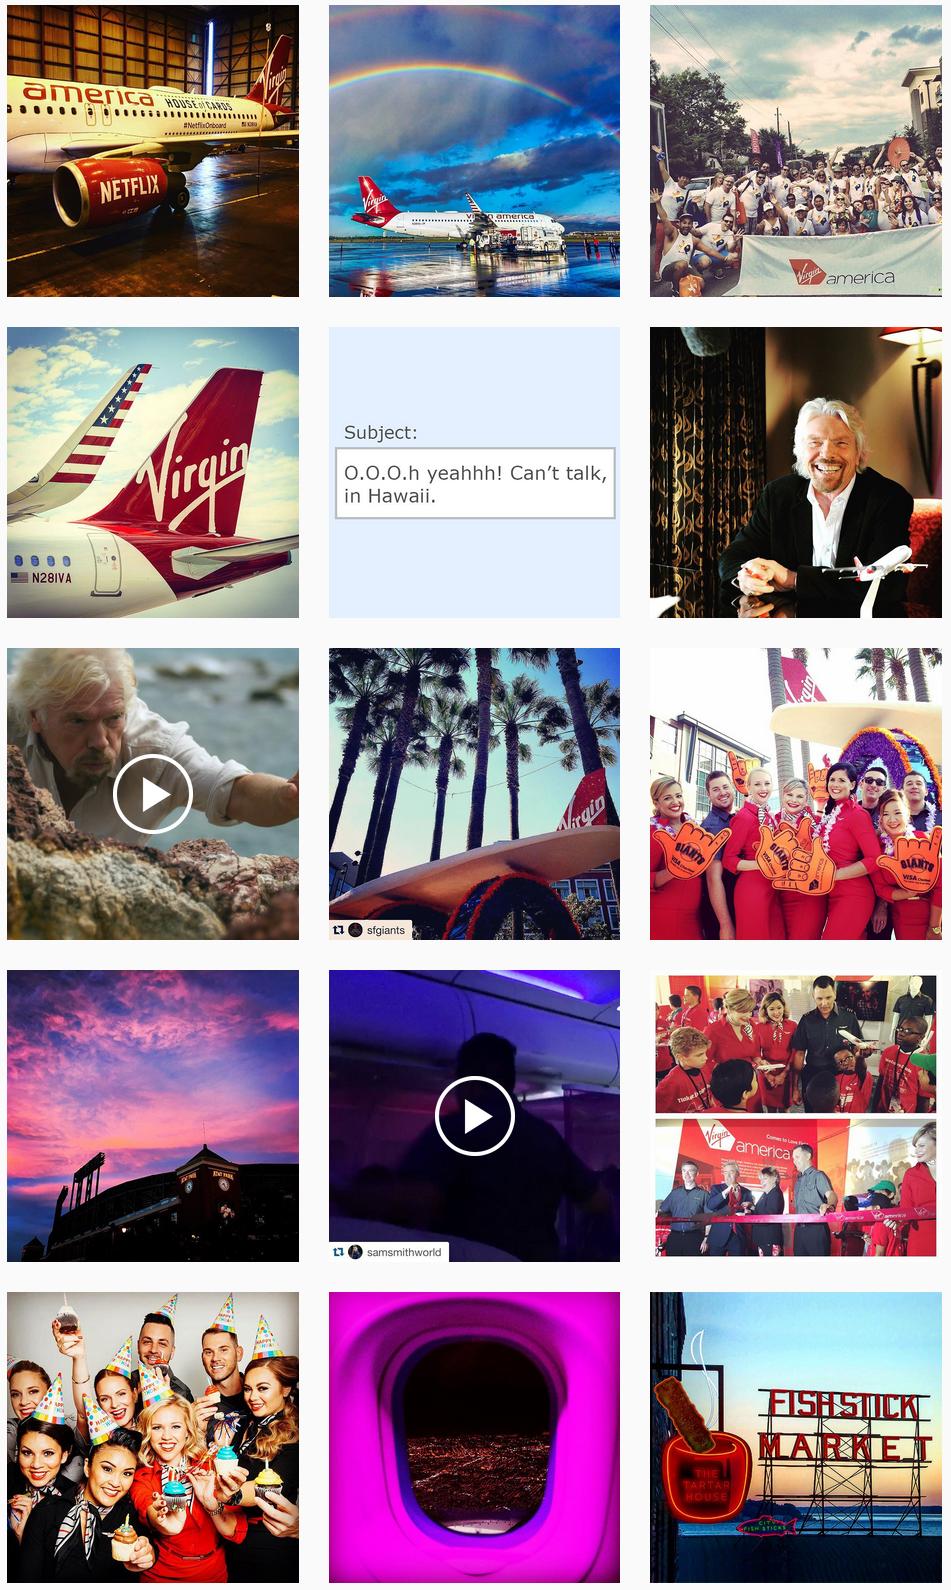 Virgin America Social Posts